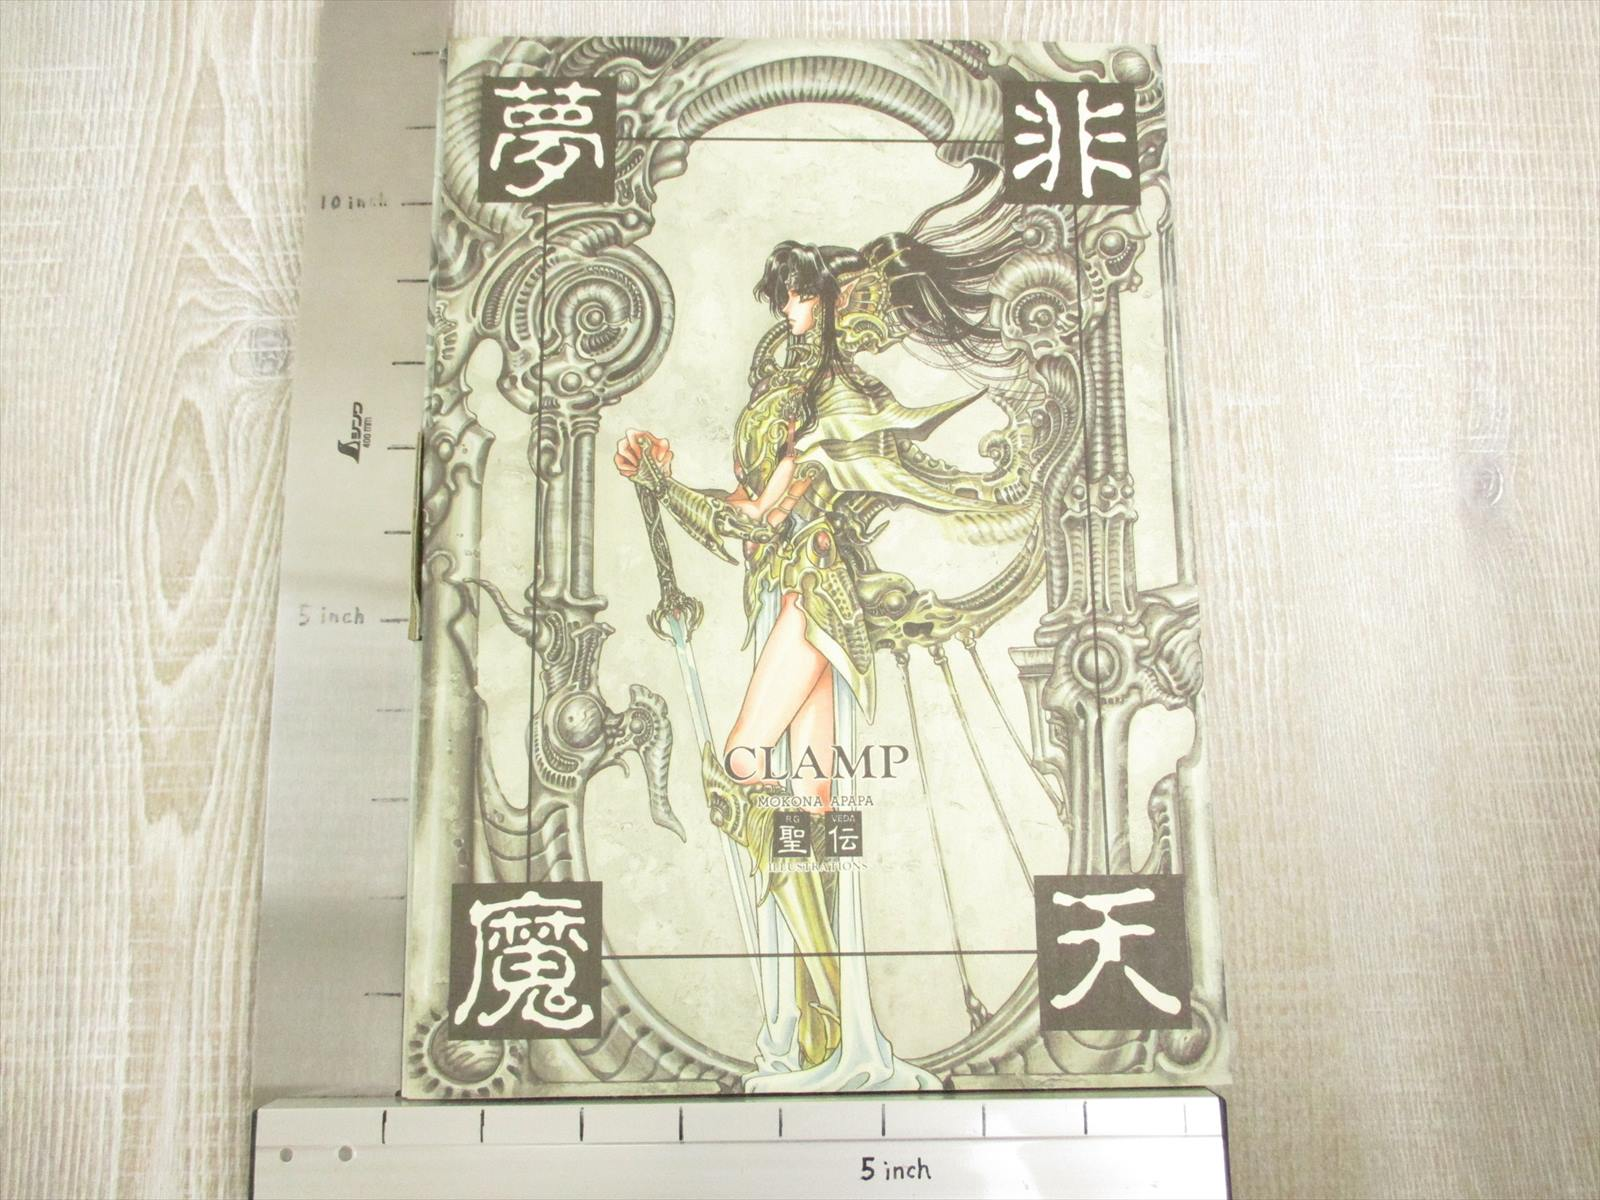 MOKONA APAPA,CLAMP RG VEDA HITEN MUMA illustration art book